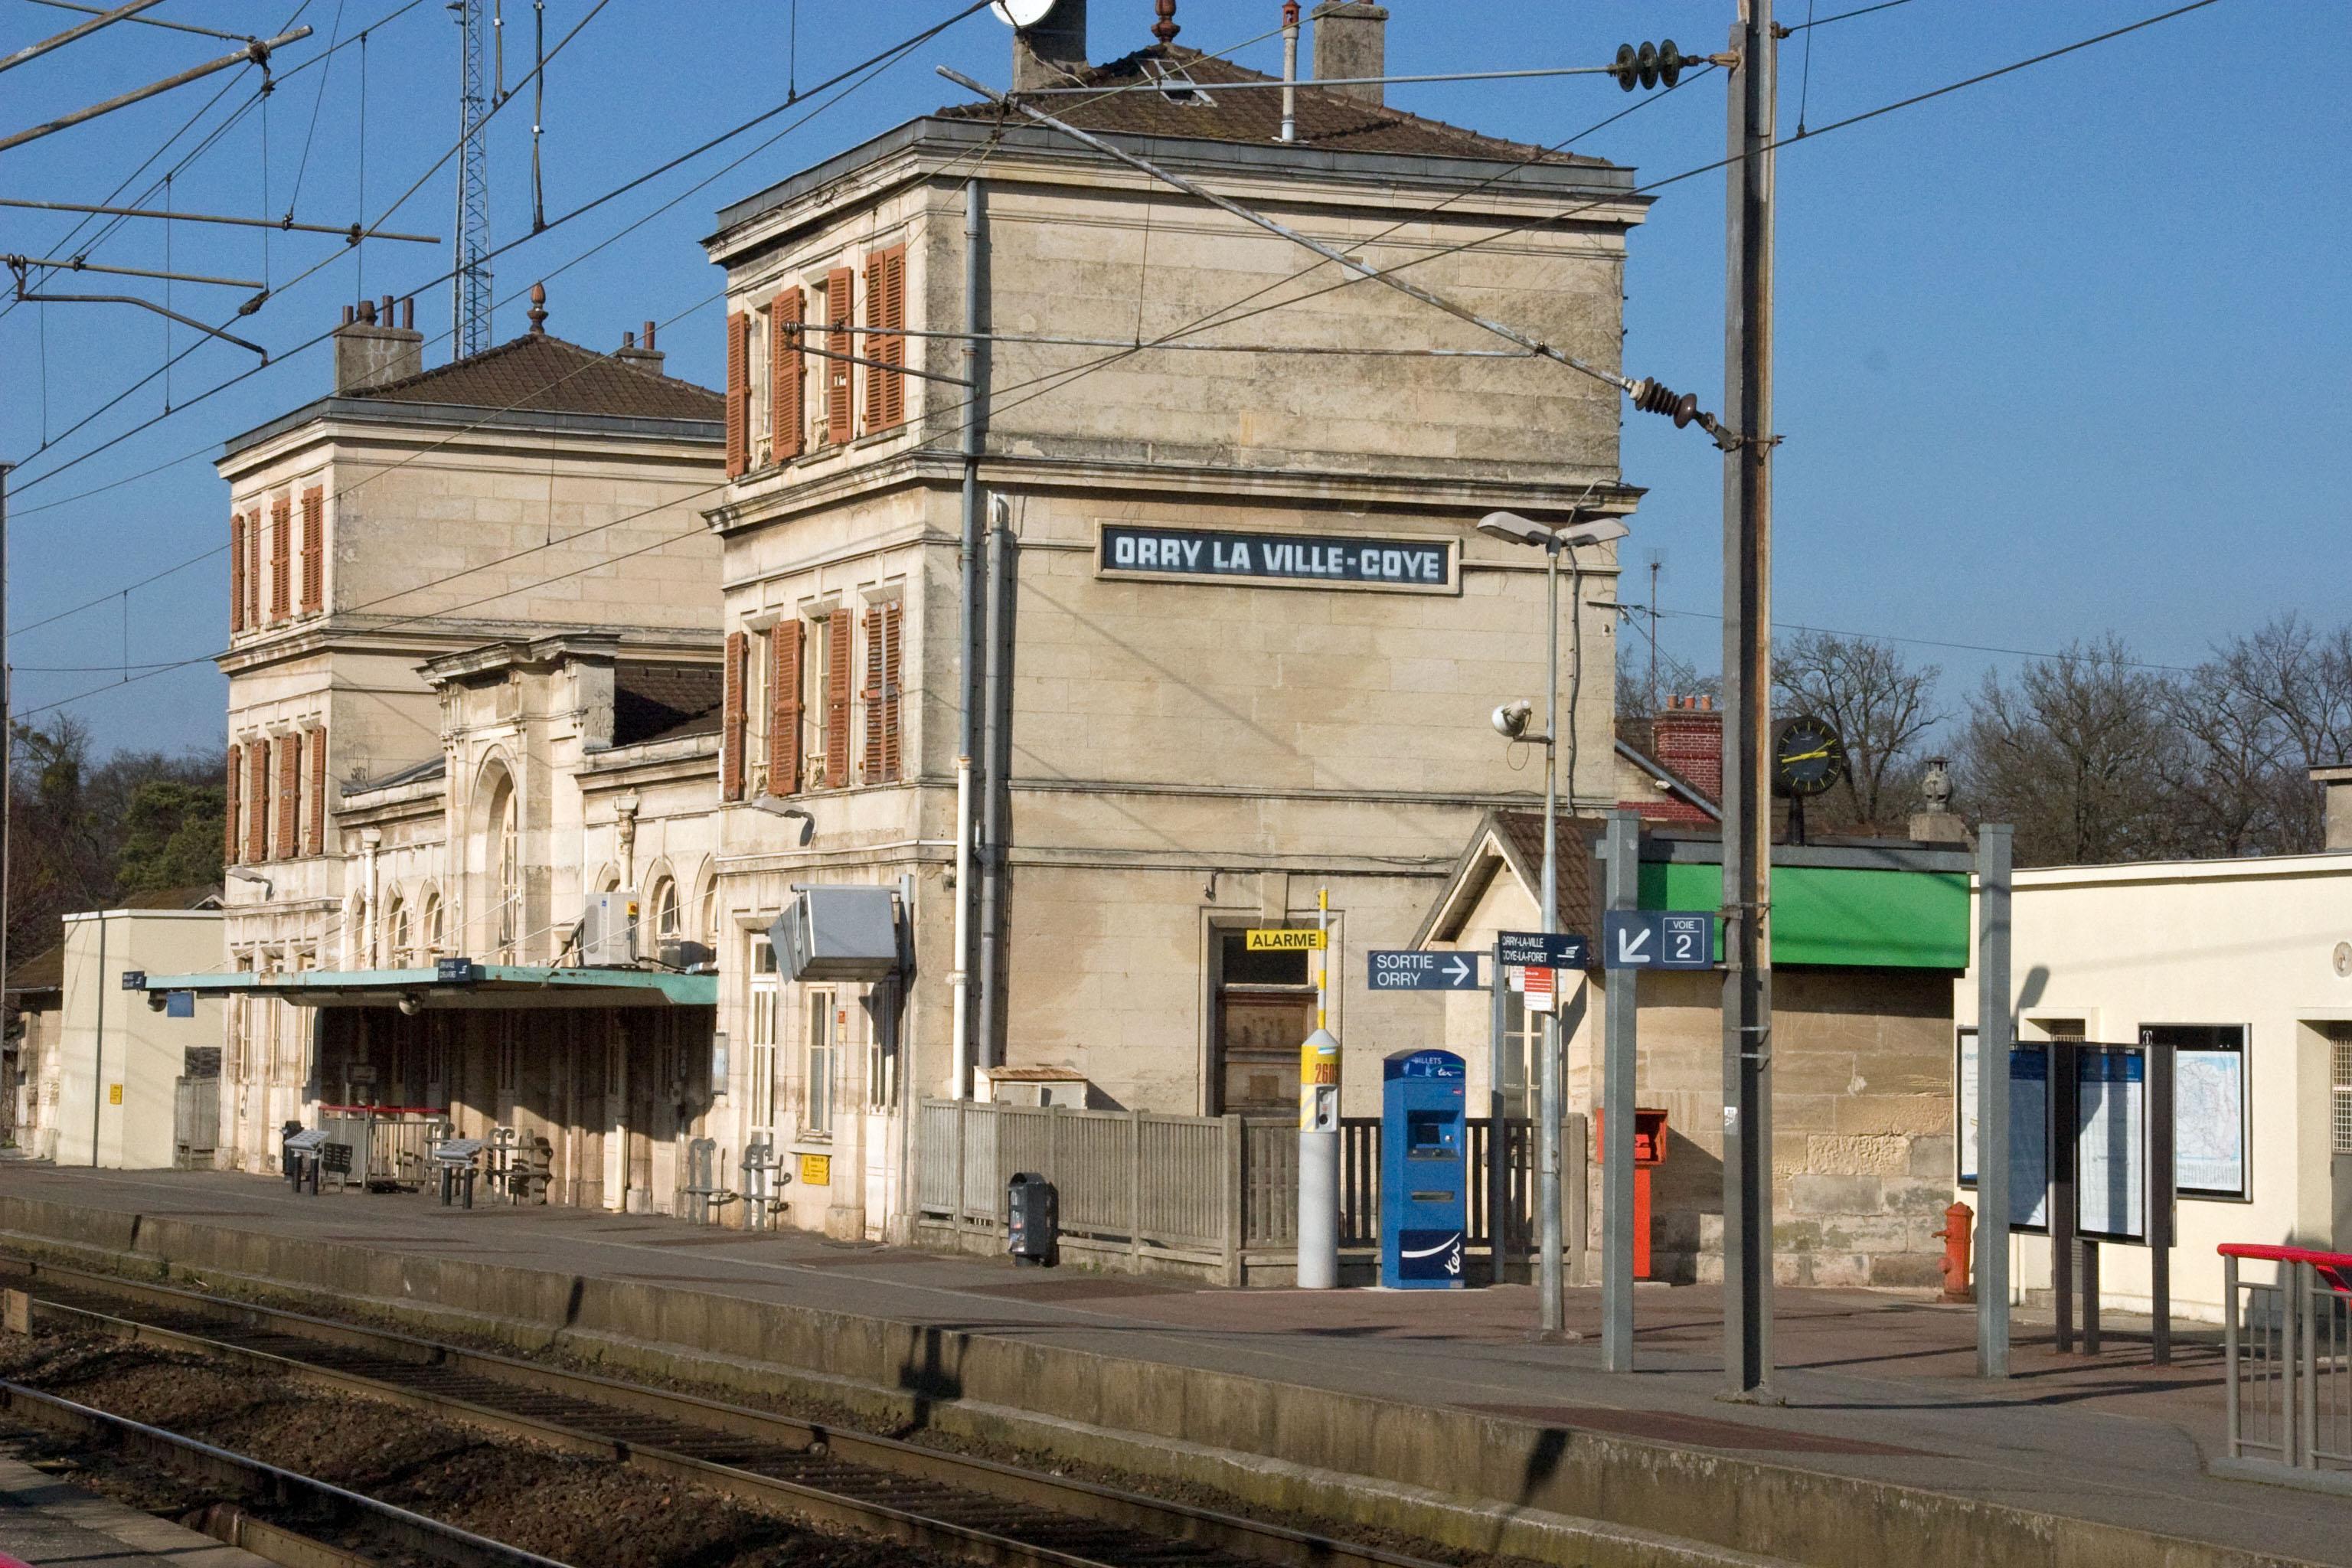 file gare de orry la ville coye crw 0875 jpg wikimedia commons